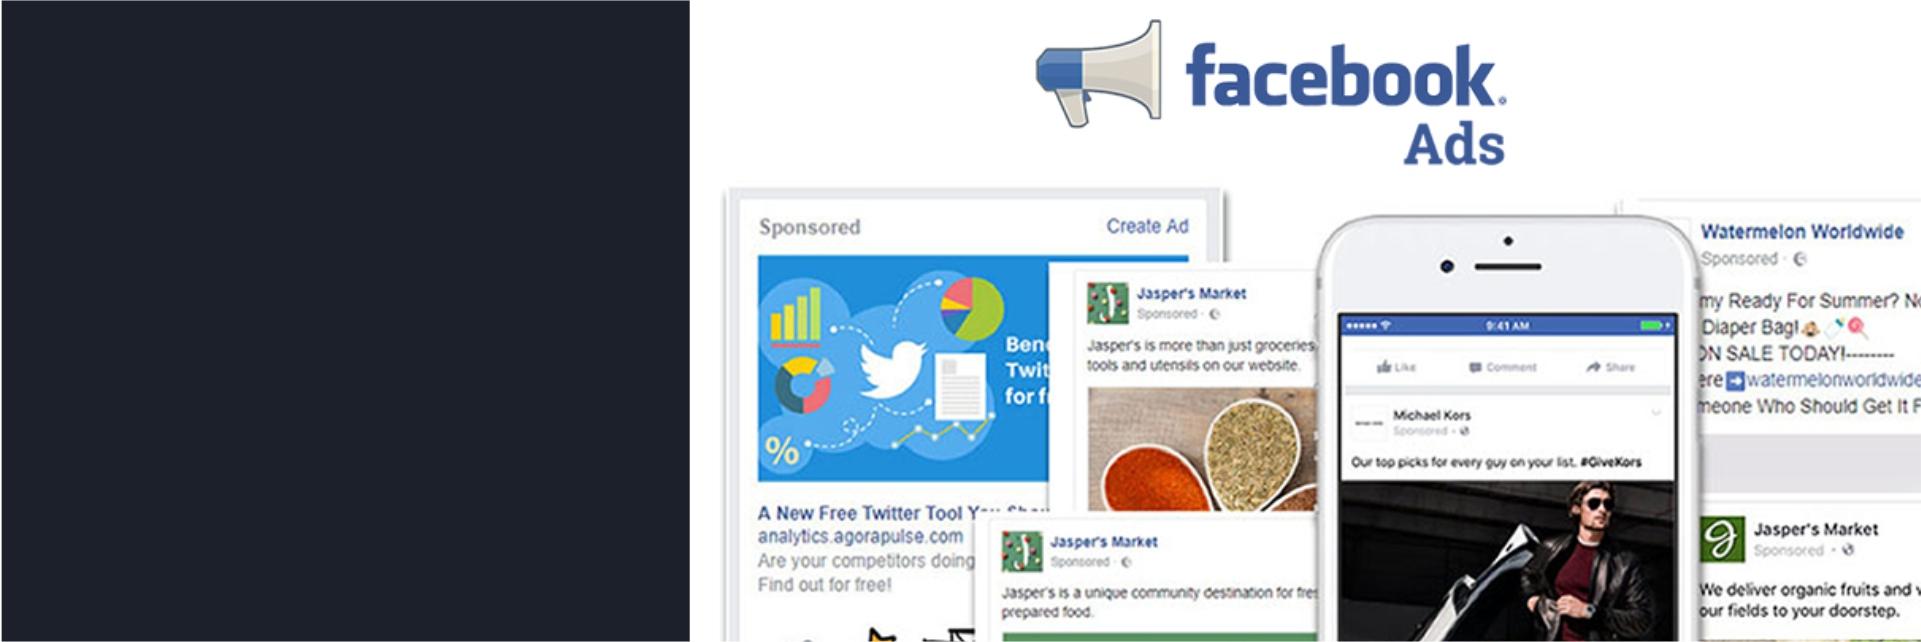 Vleeko Ventajas de Facebook Ads